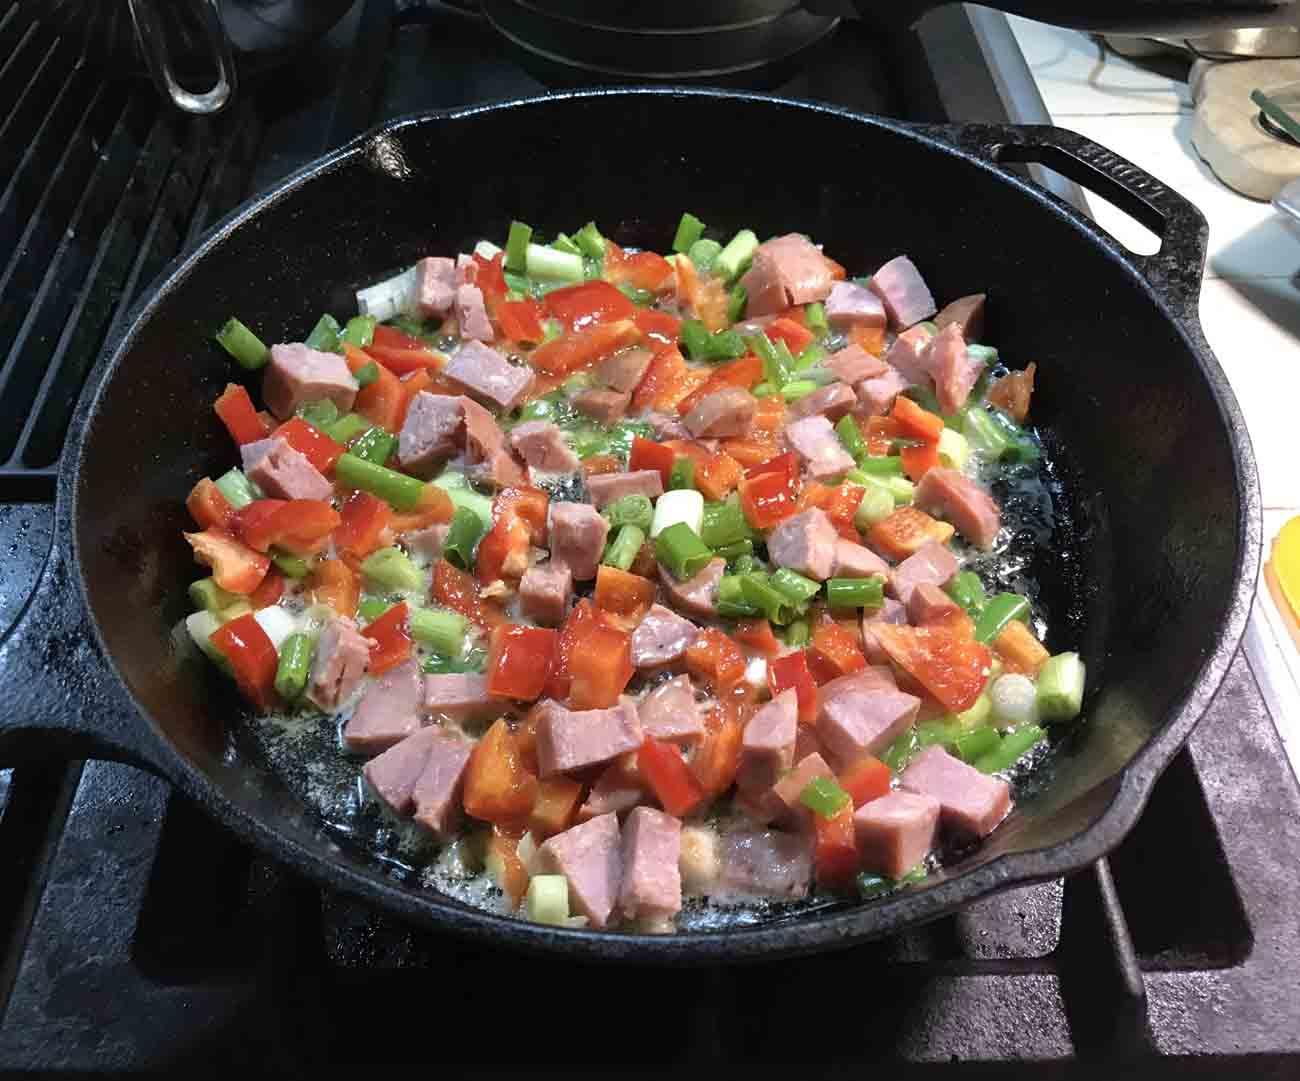 GrannyKeto.com Recipes: Frittata Fillings